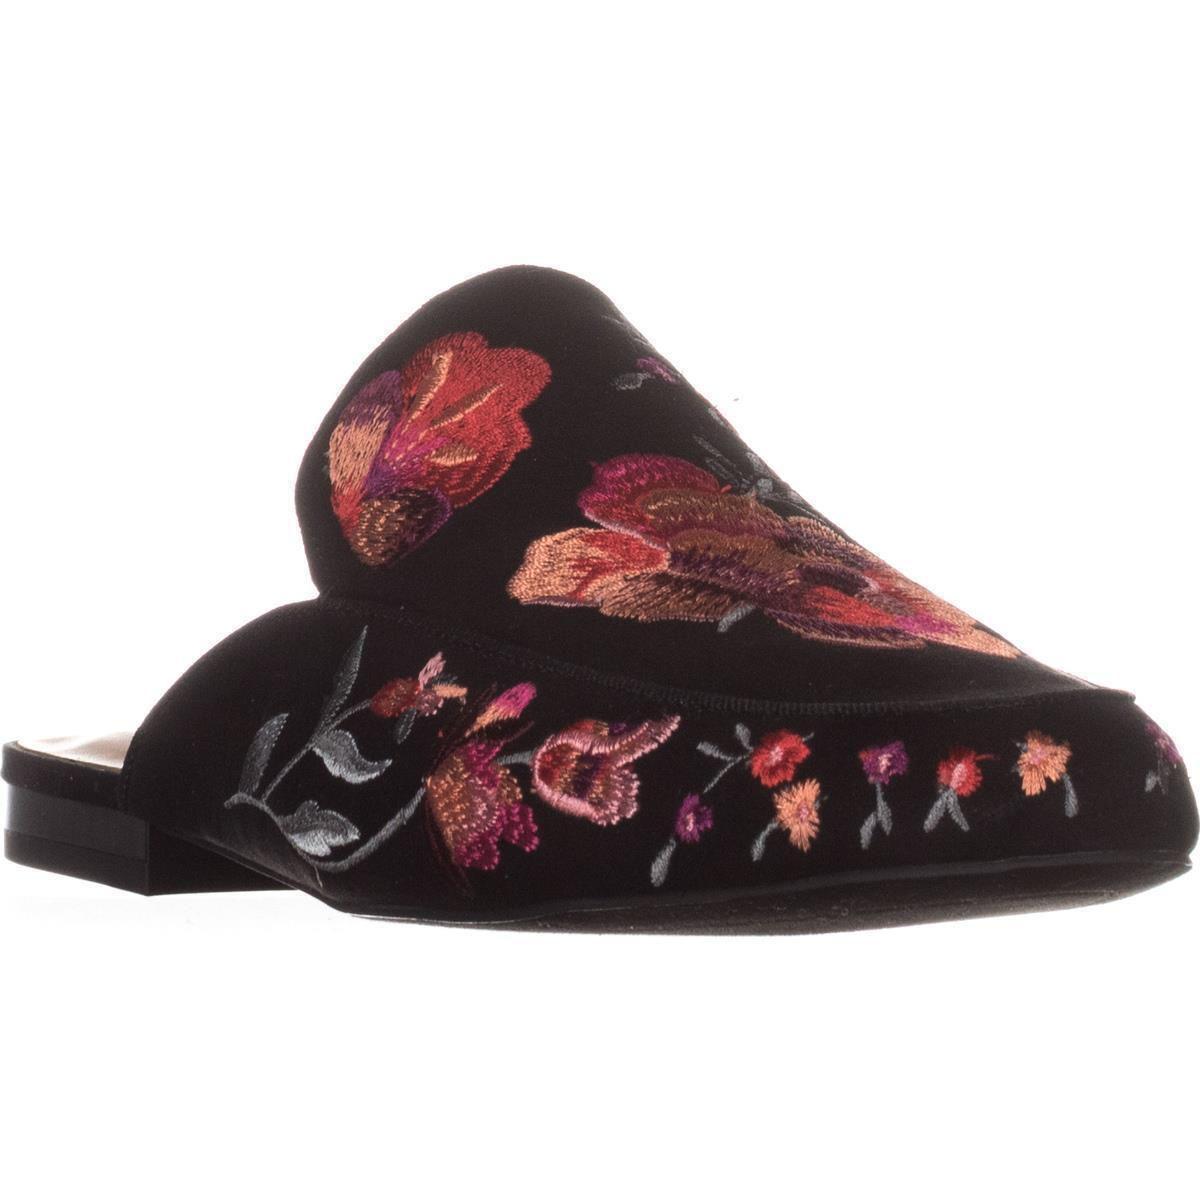 INC International Concepts gannie2 Womens Loafers & SlipOns Black 9  US   7 UK